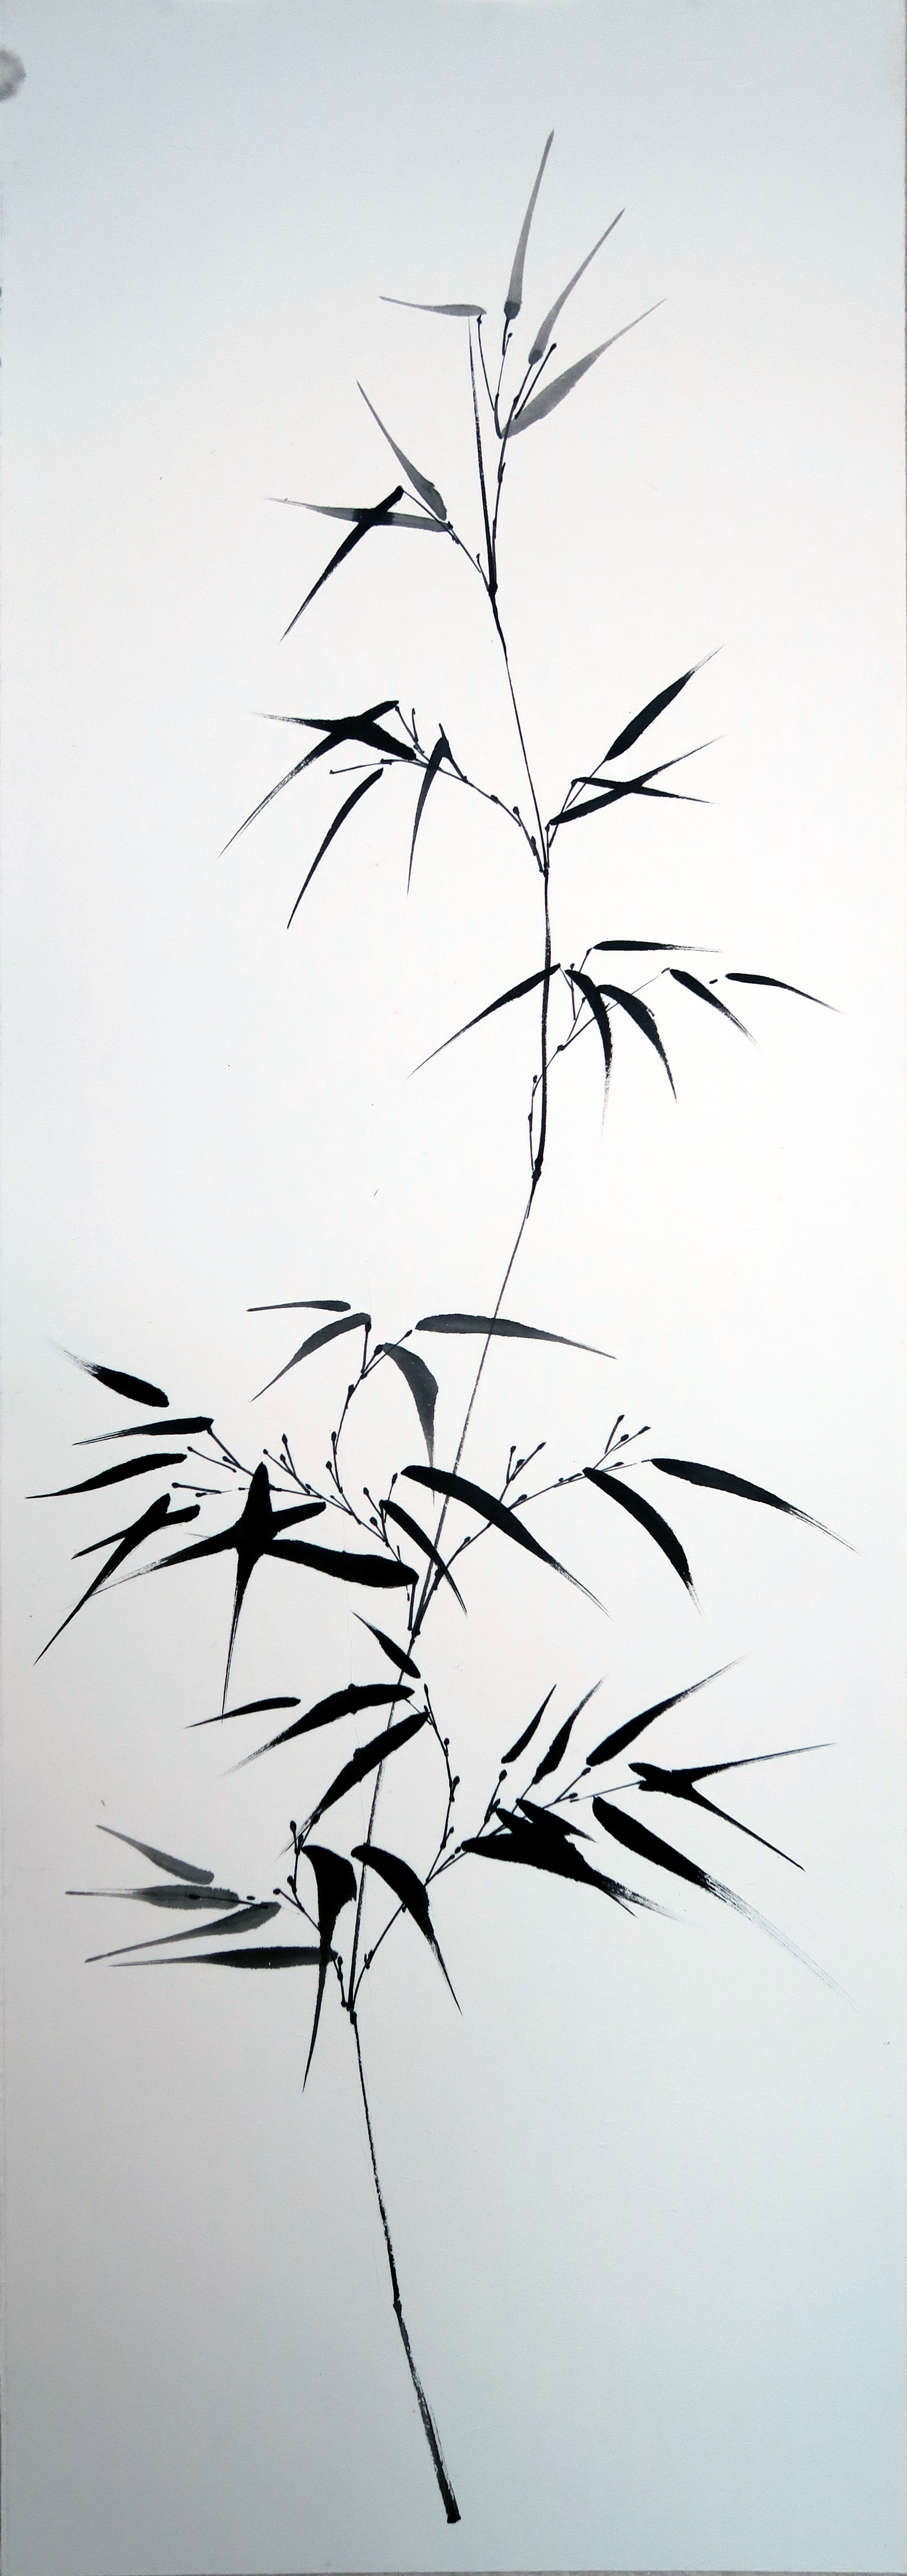 Bambou gracile